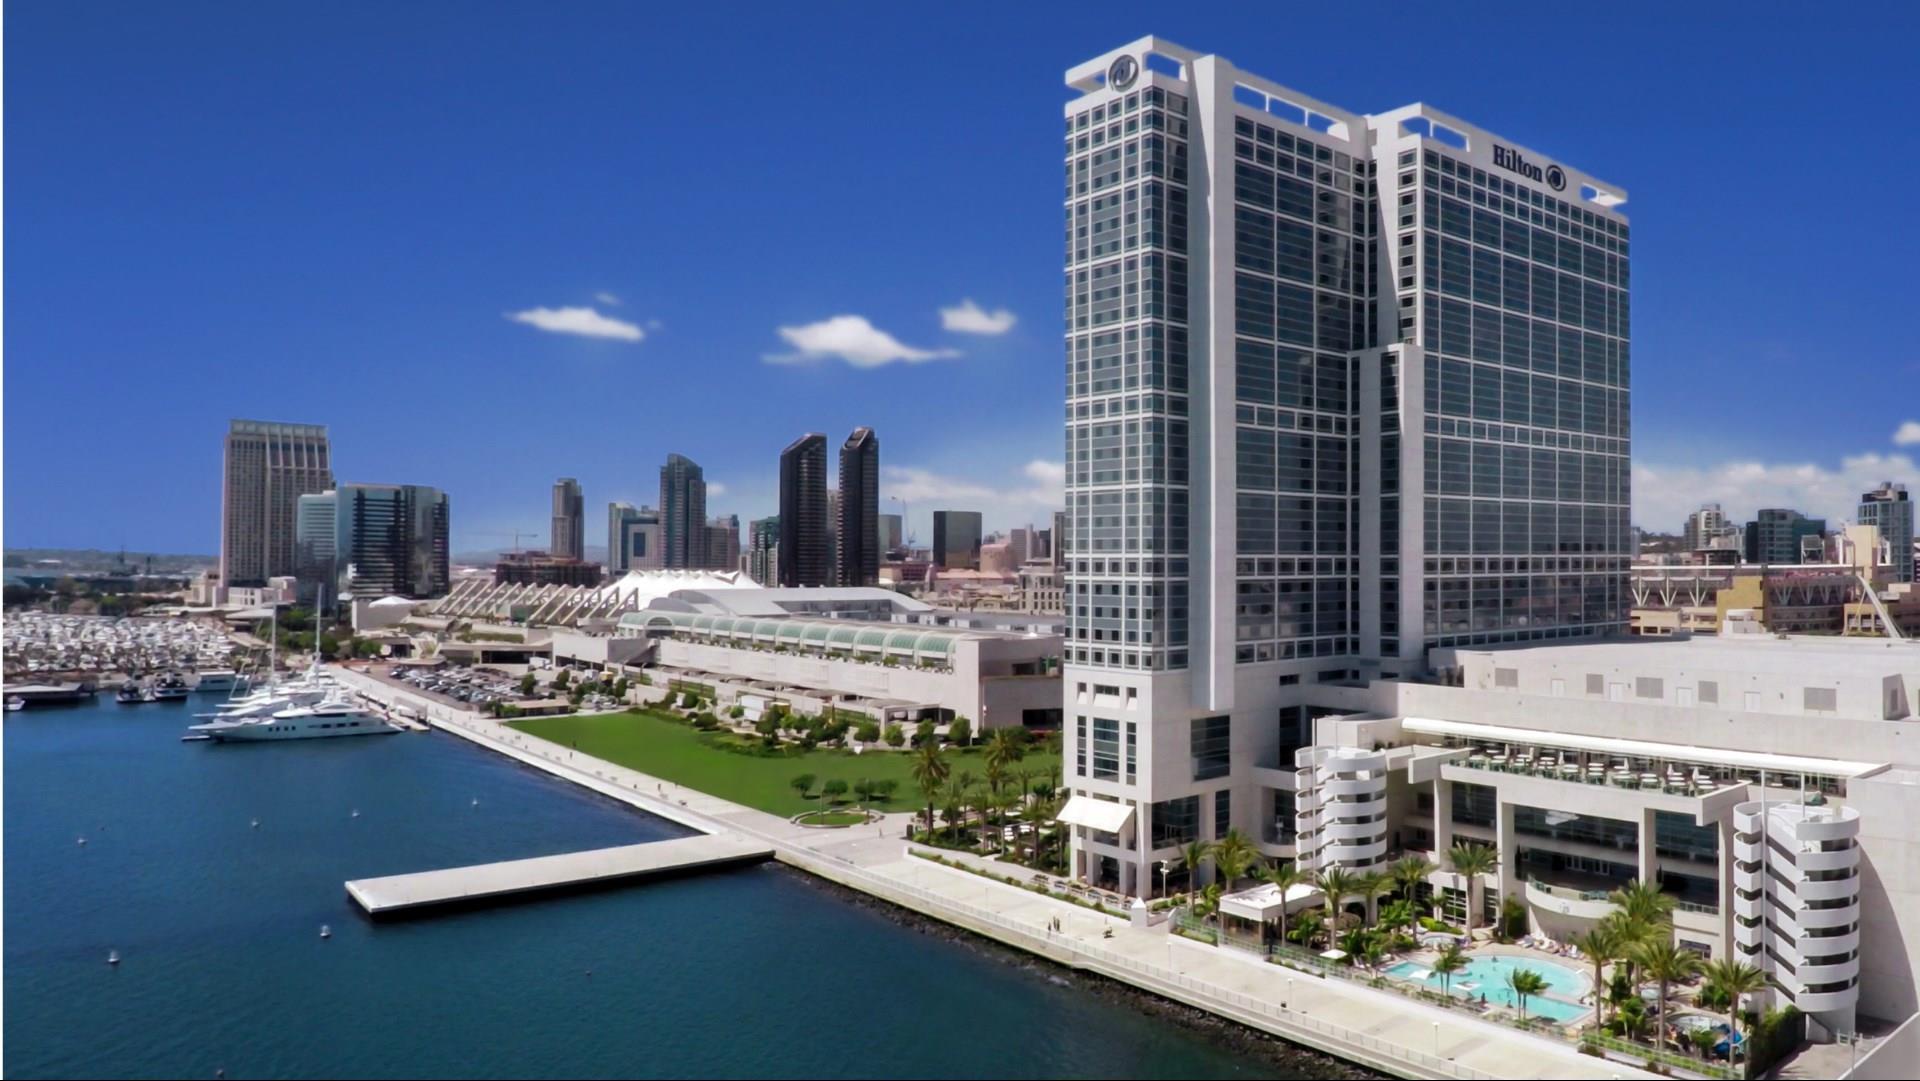 IMS, Inc at Hilton Bayfront